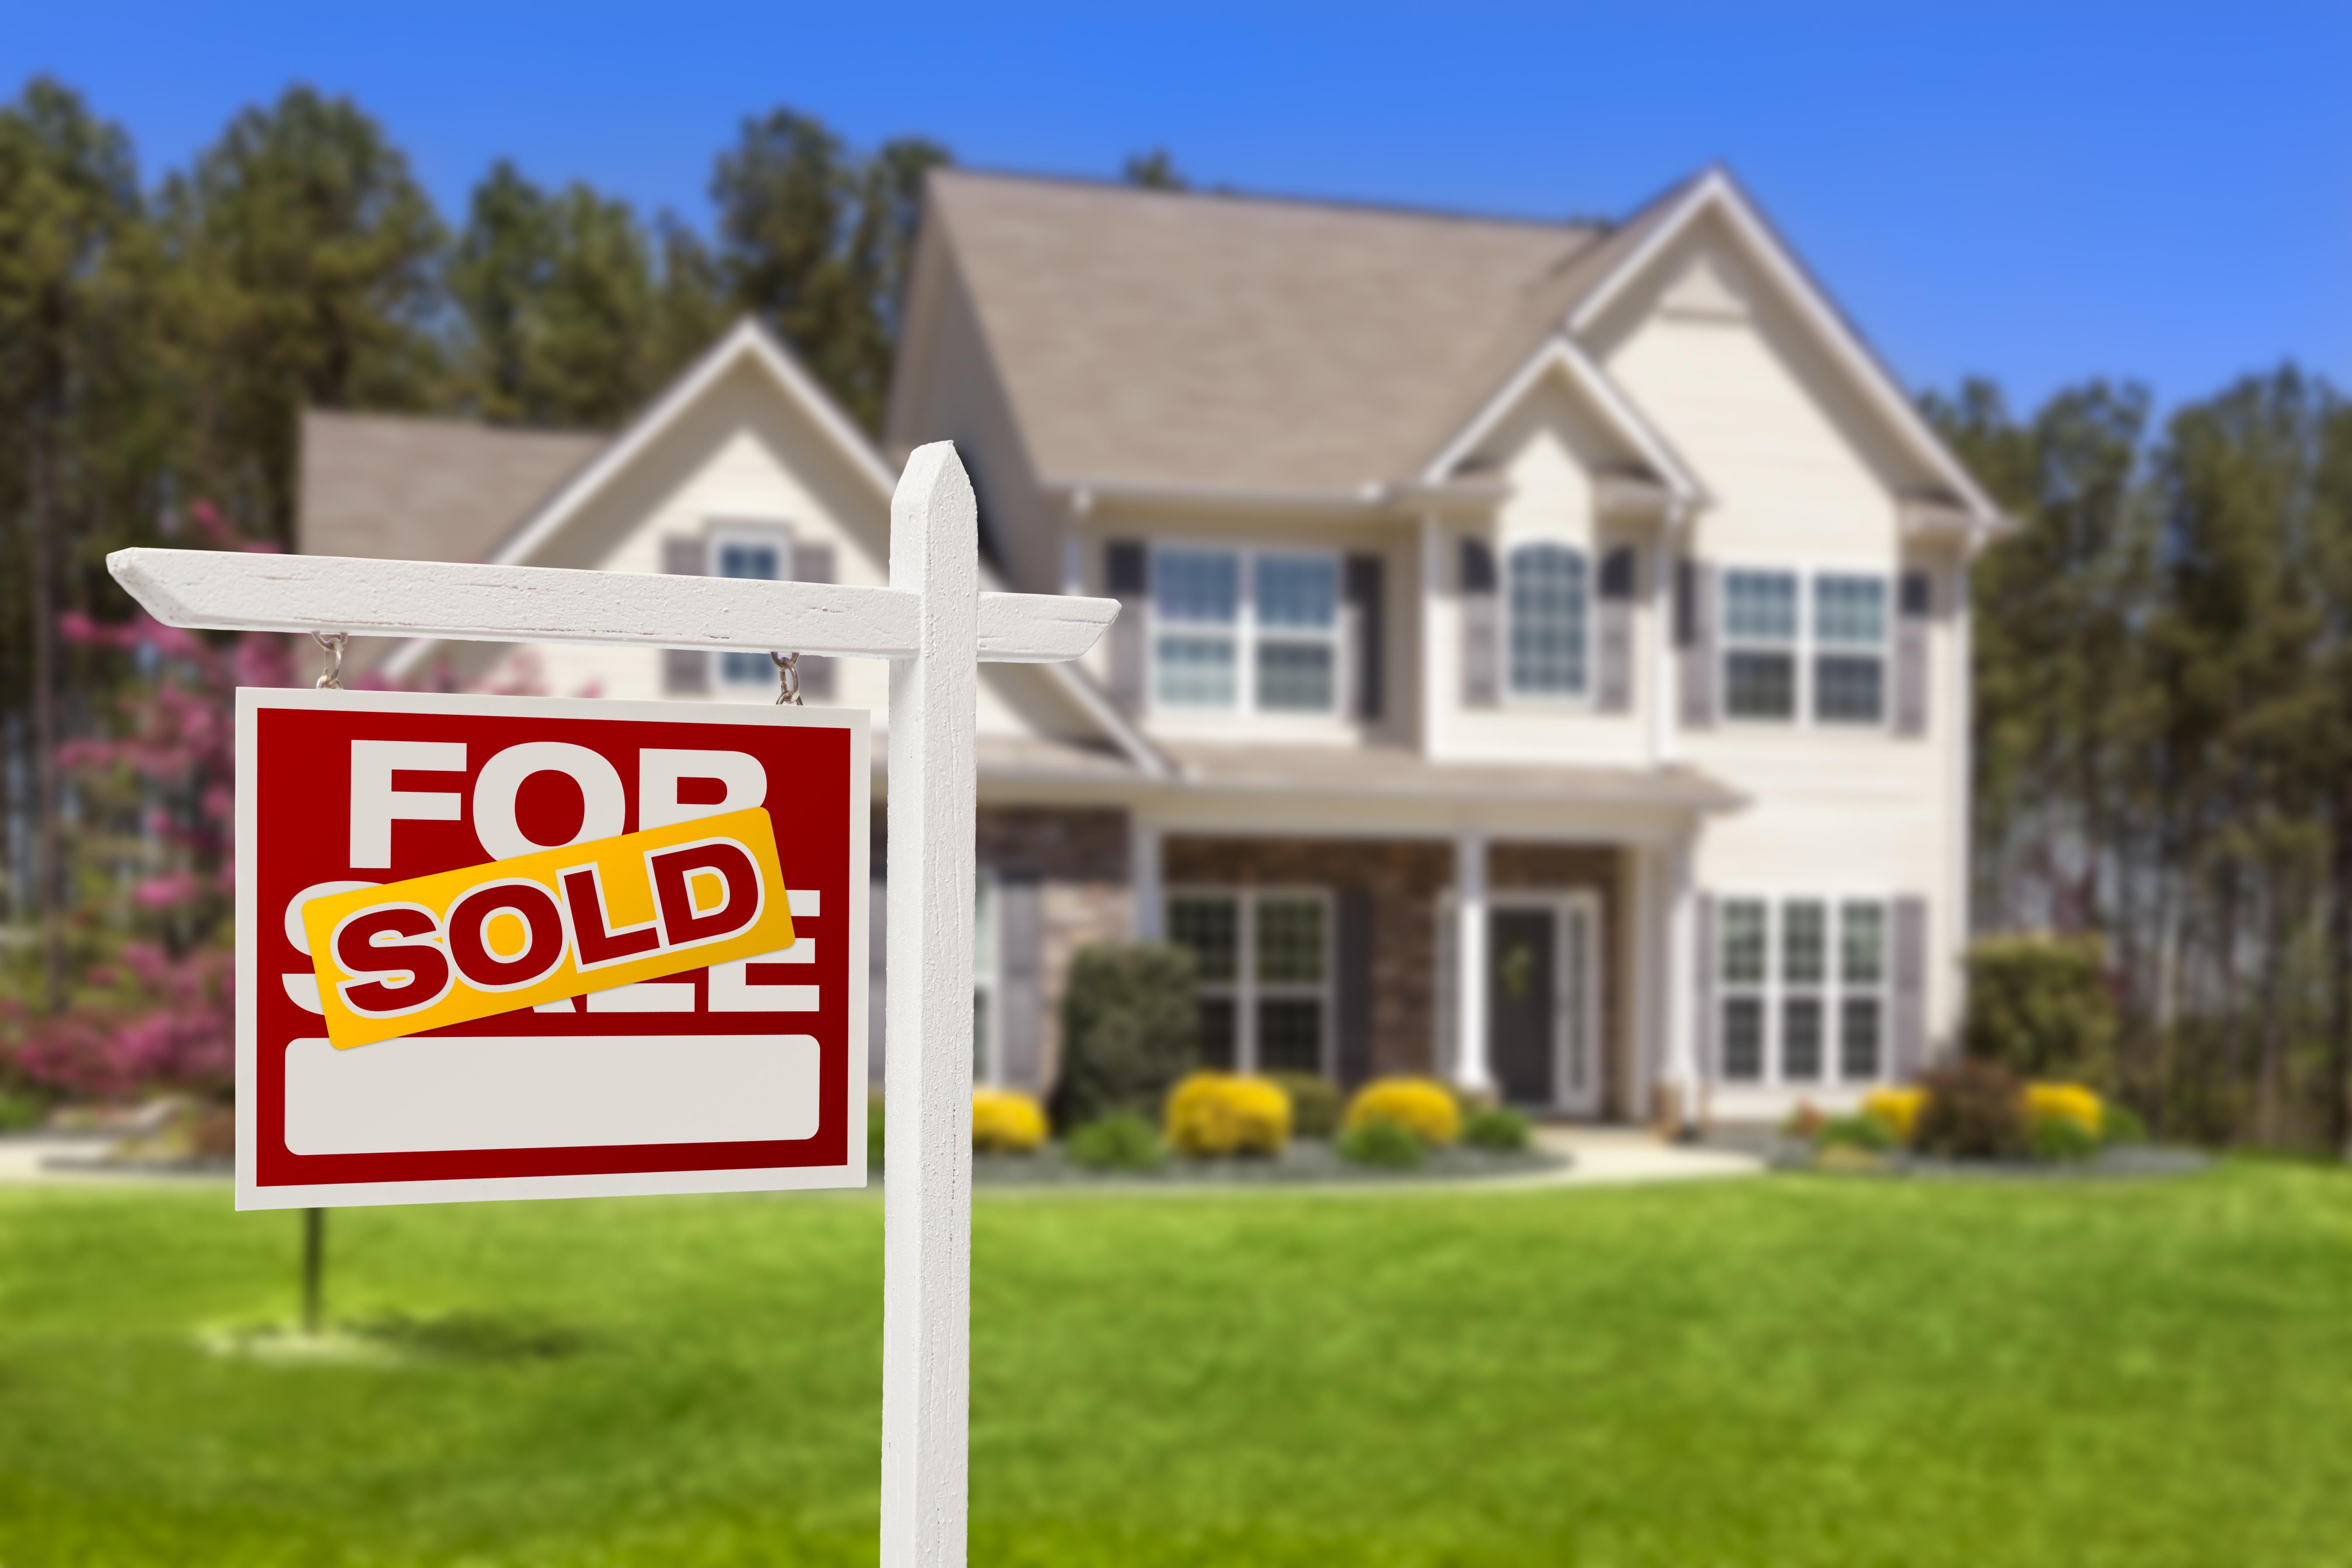 Homes For Sale in Provo, Utah